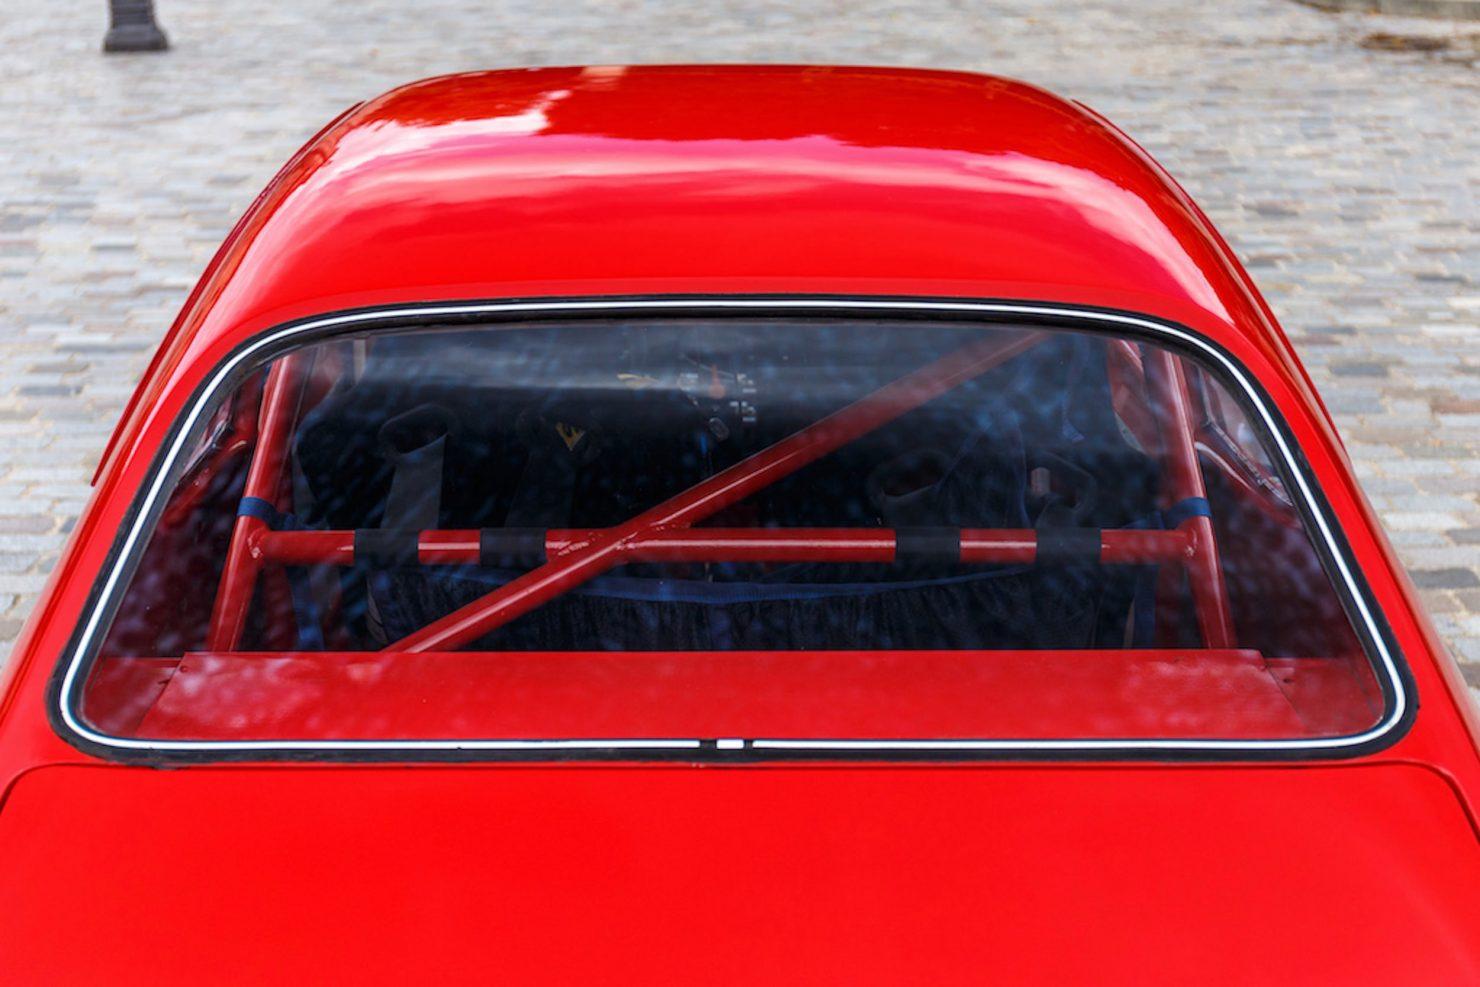 opel kadett rallye car 2 1480x987 - 1969 Opel Rallye Kadett